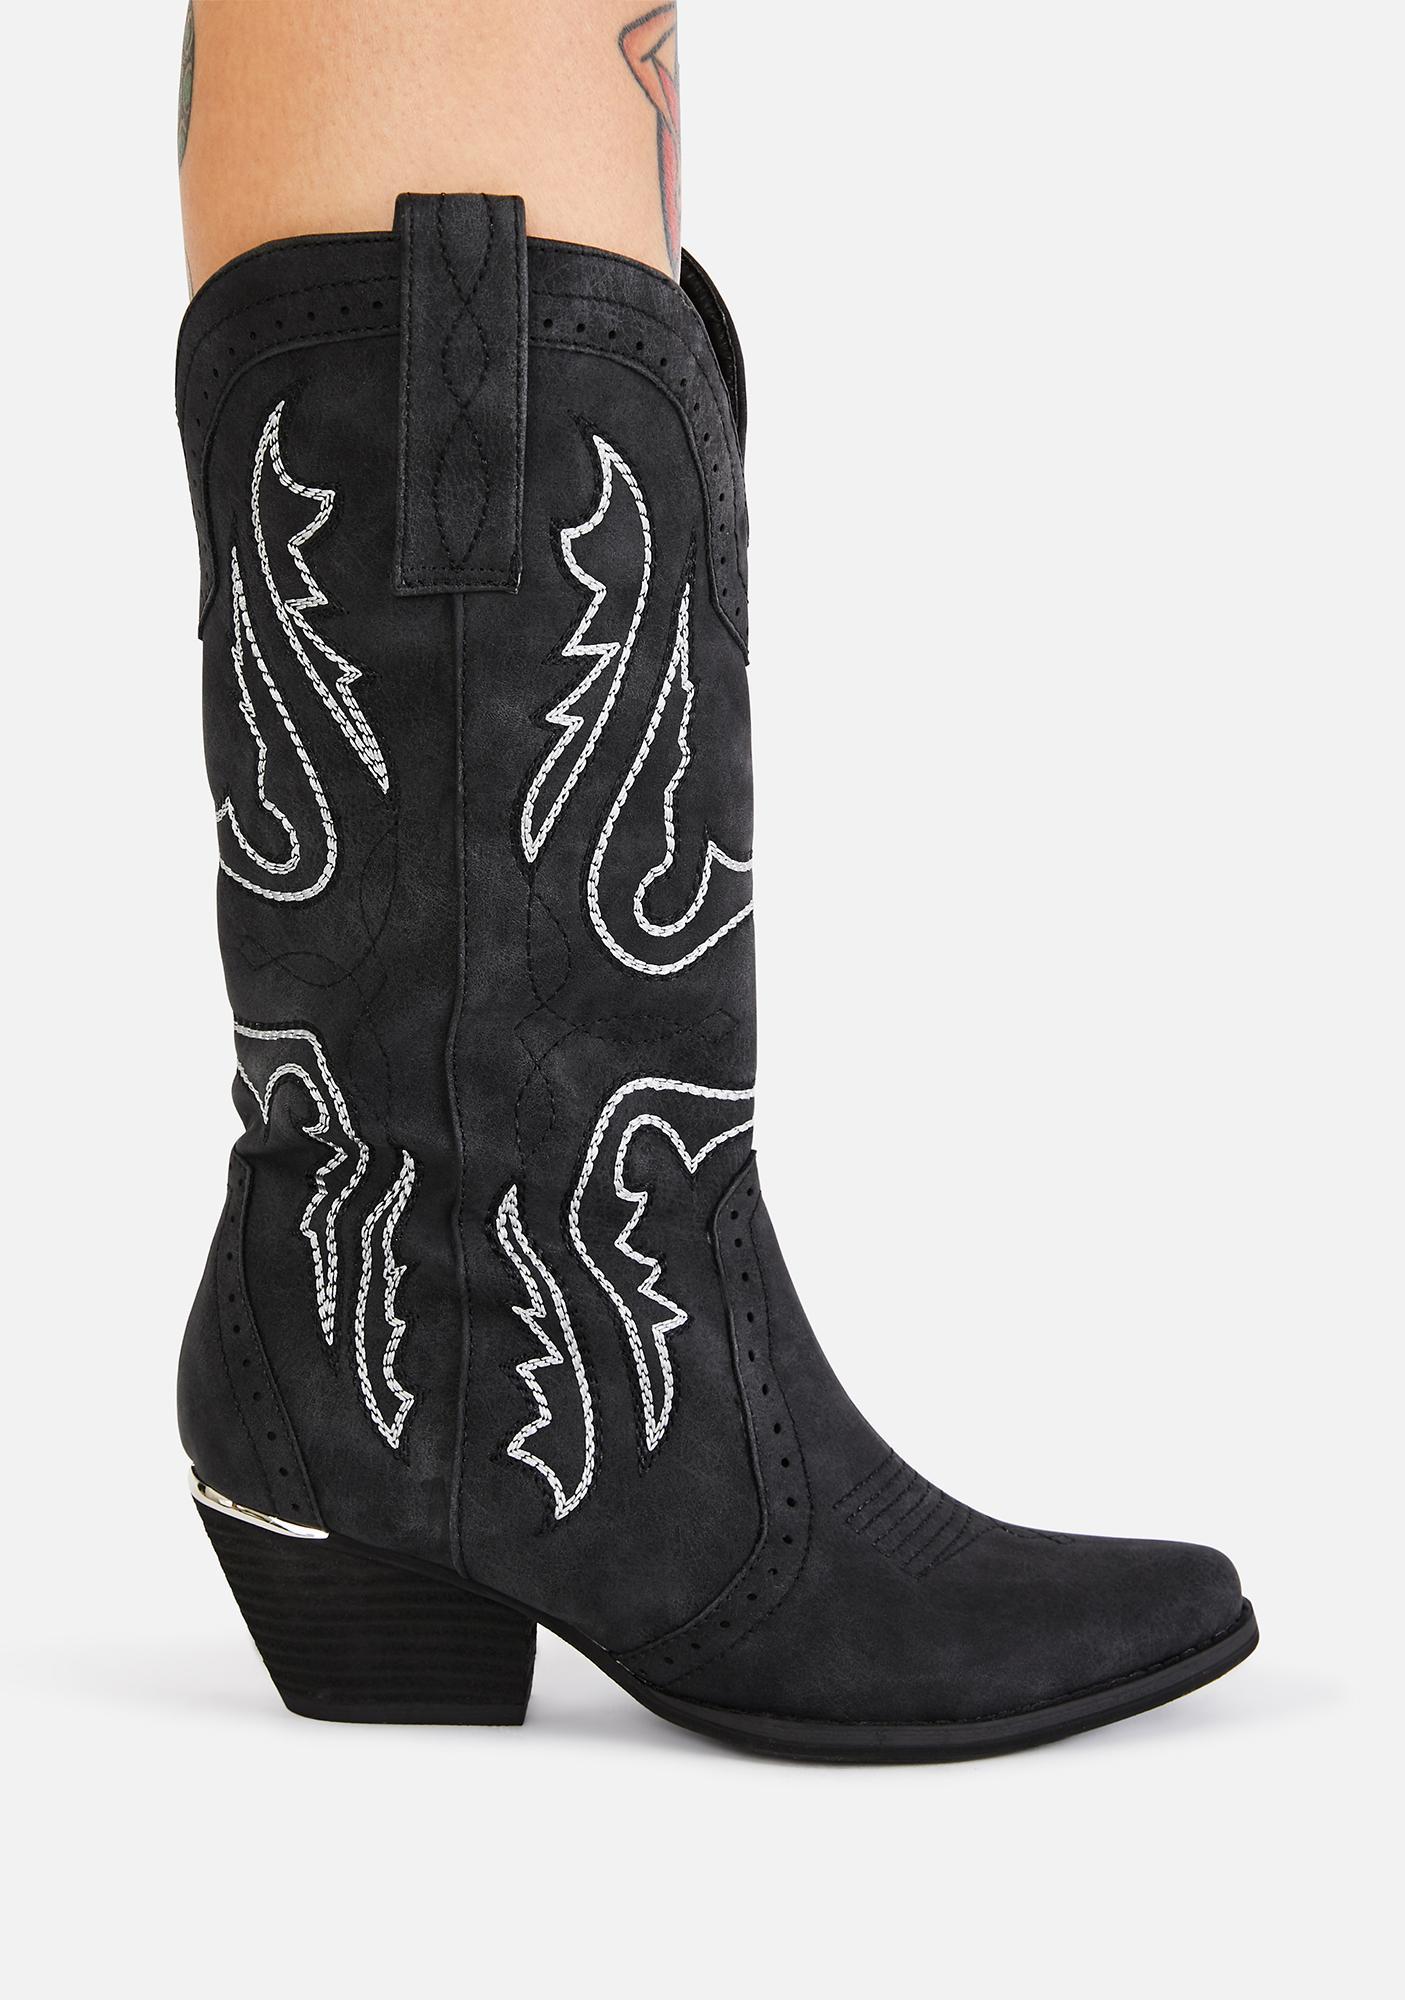 Volatile Shoes Black Westlake Cowboy Boots